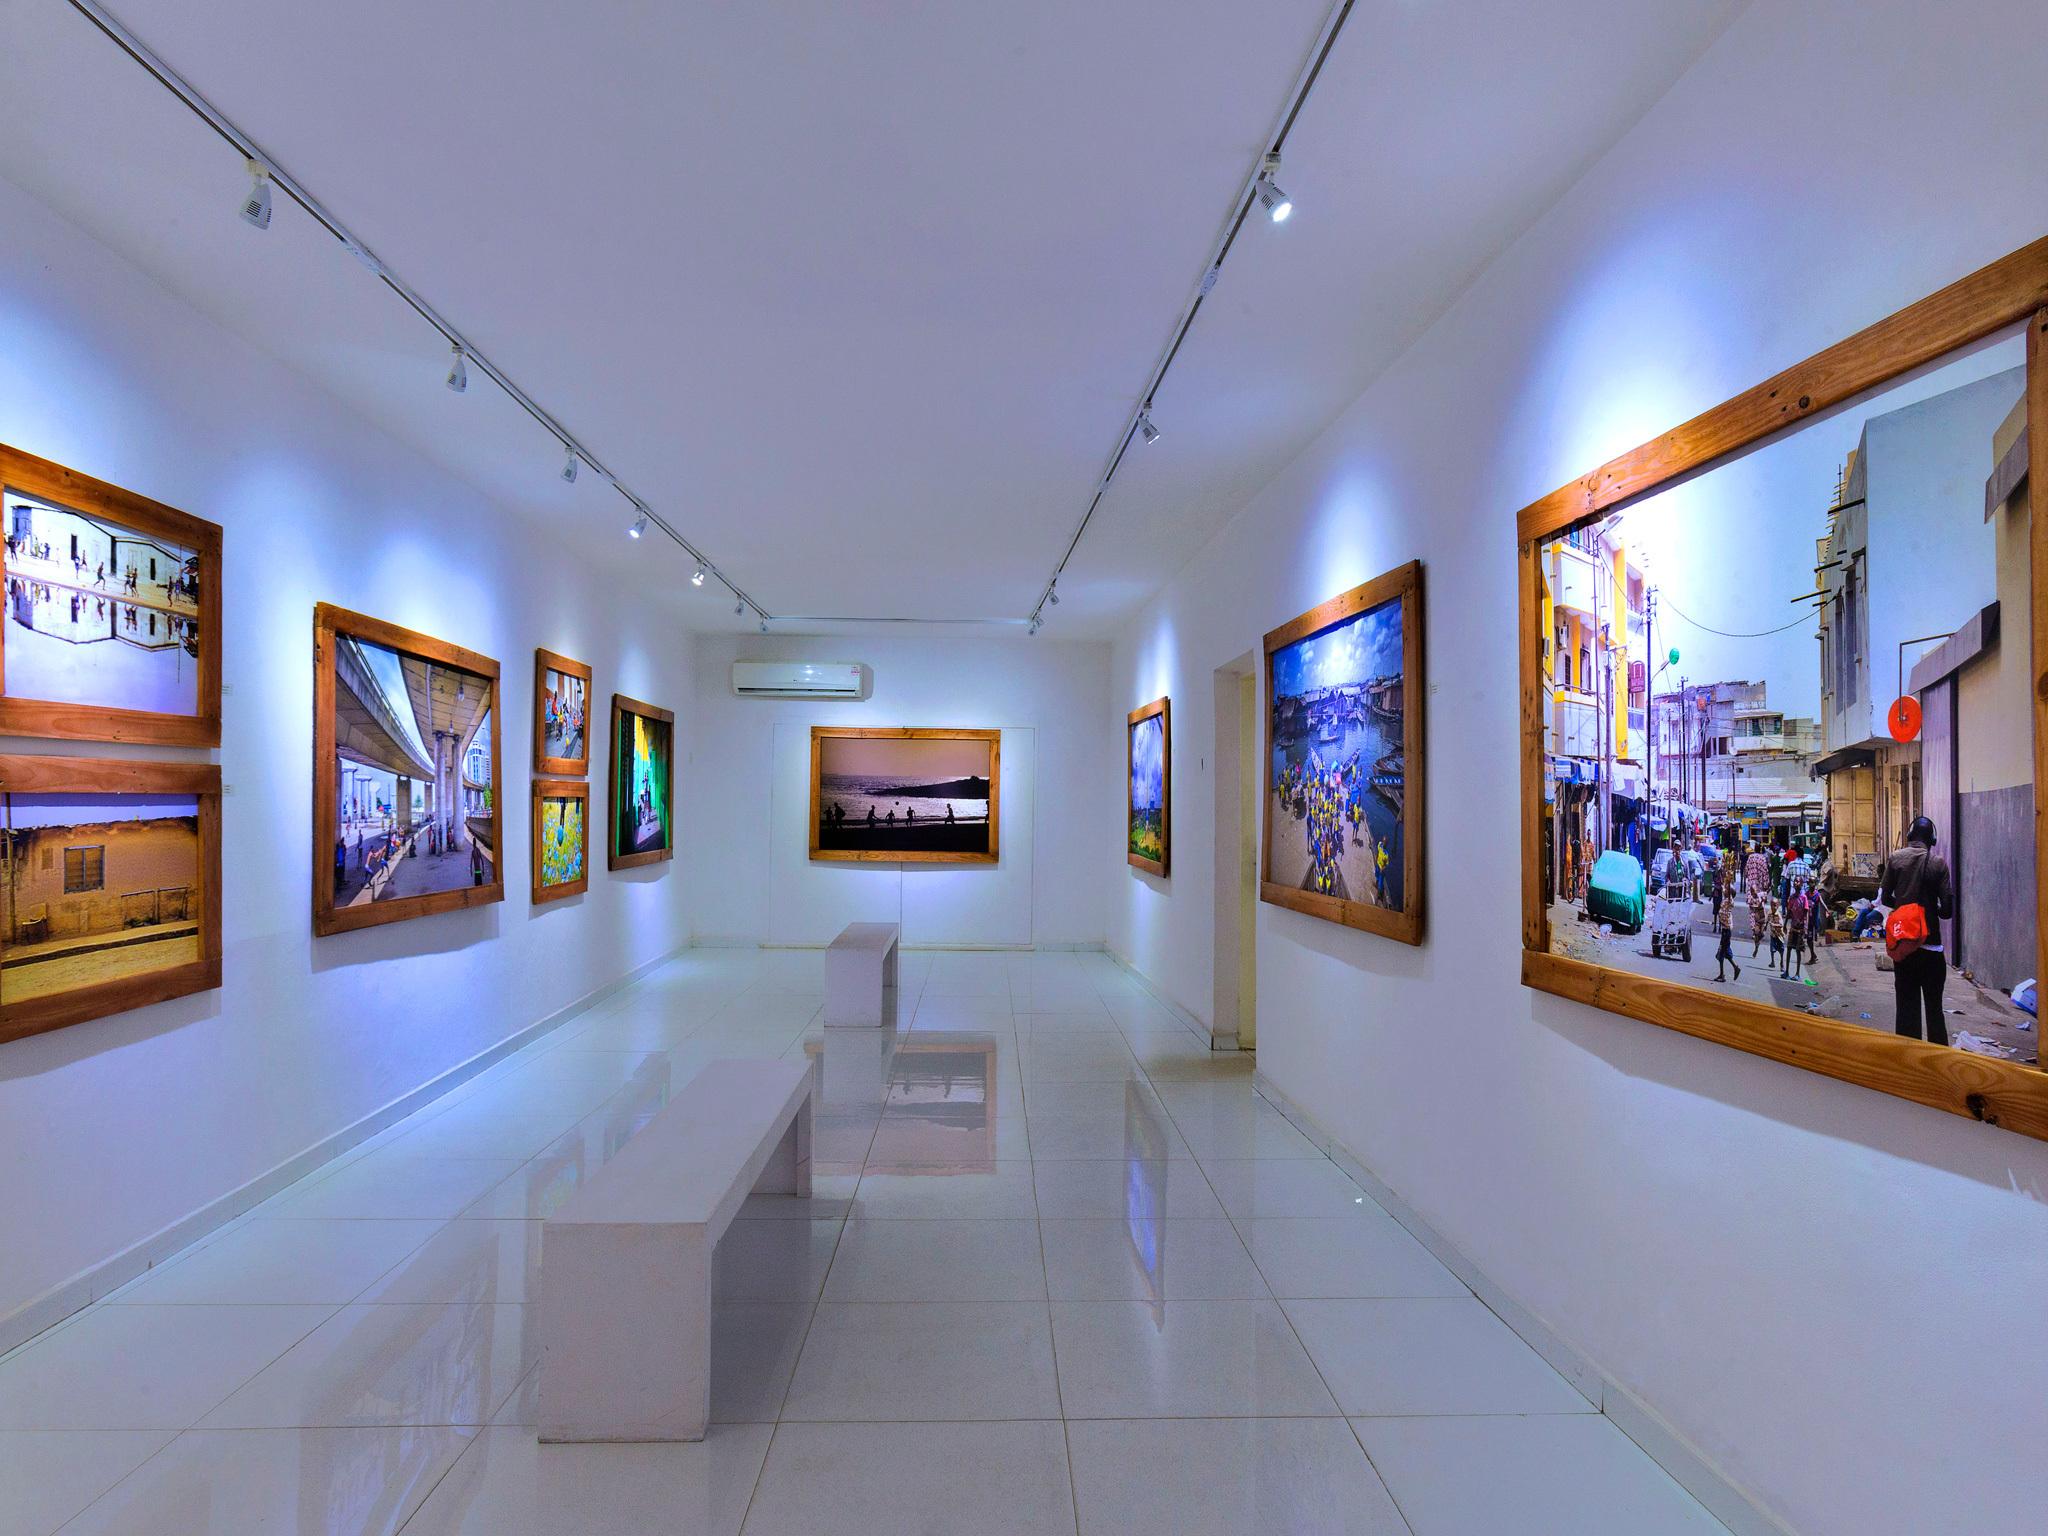 Rele Gallery in Onikan, Lagos